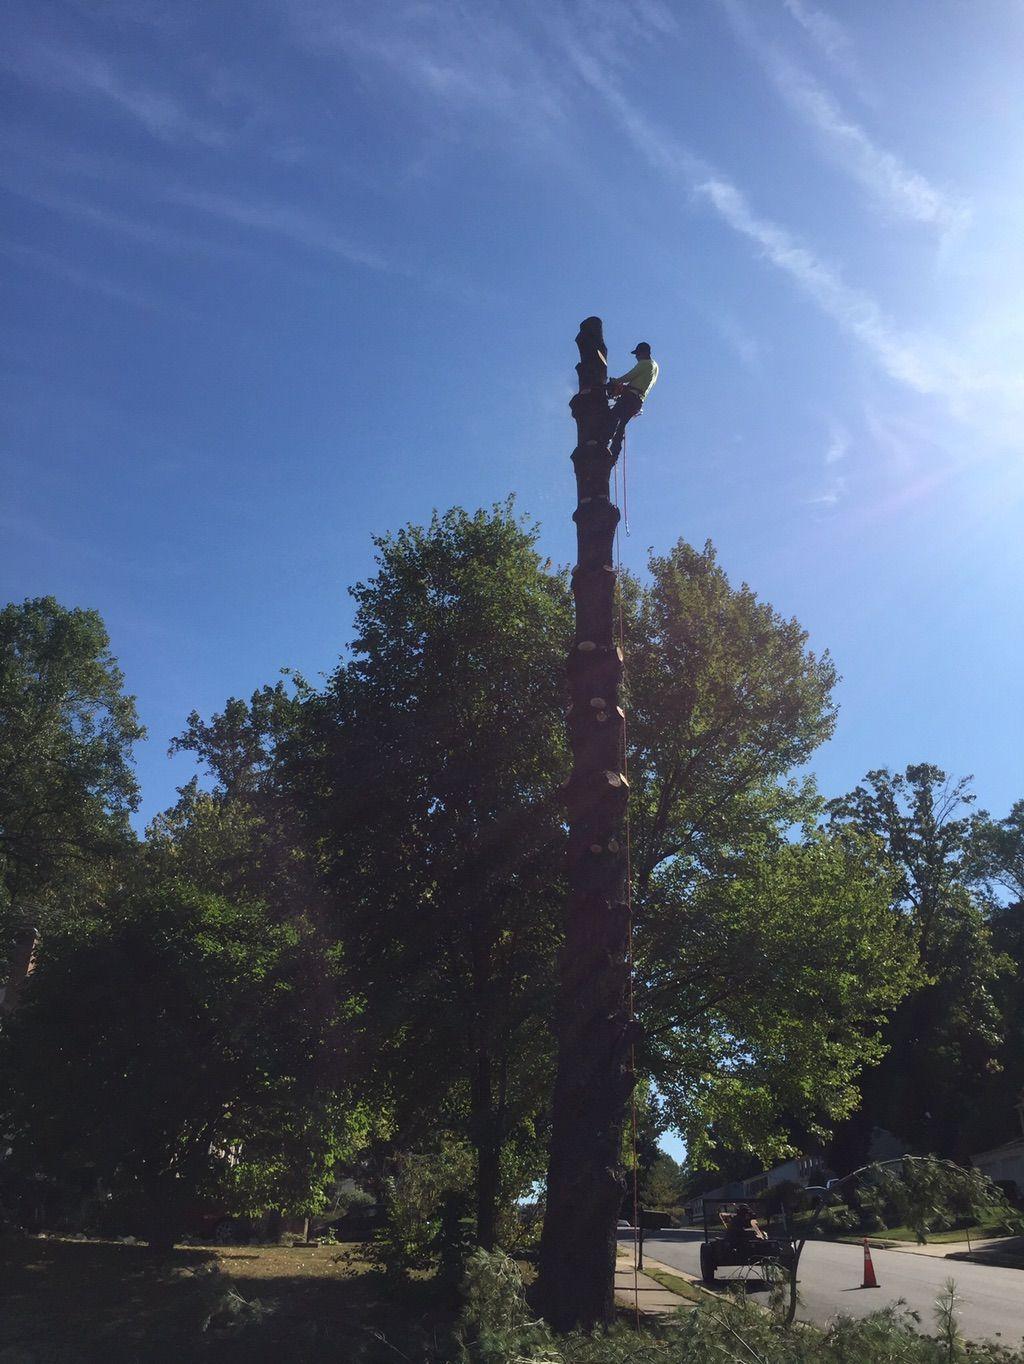 Nain Tree service & home improvement